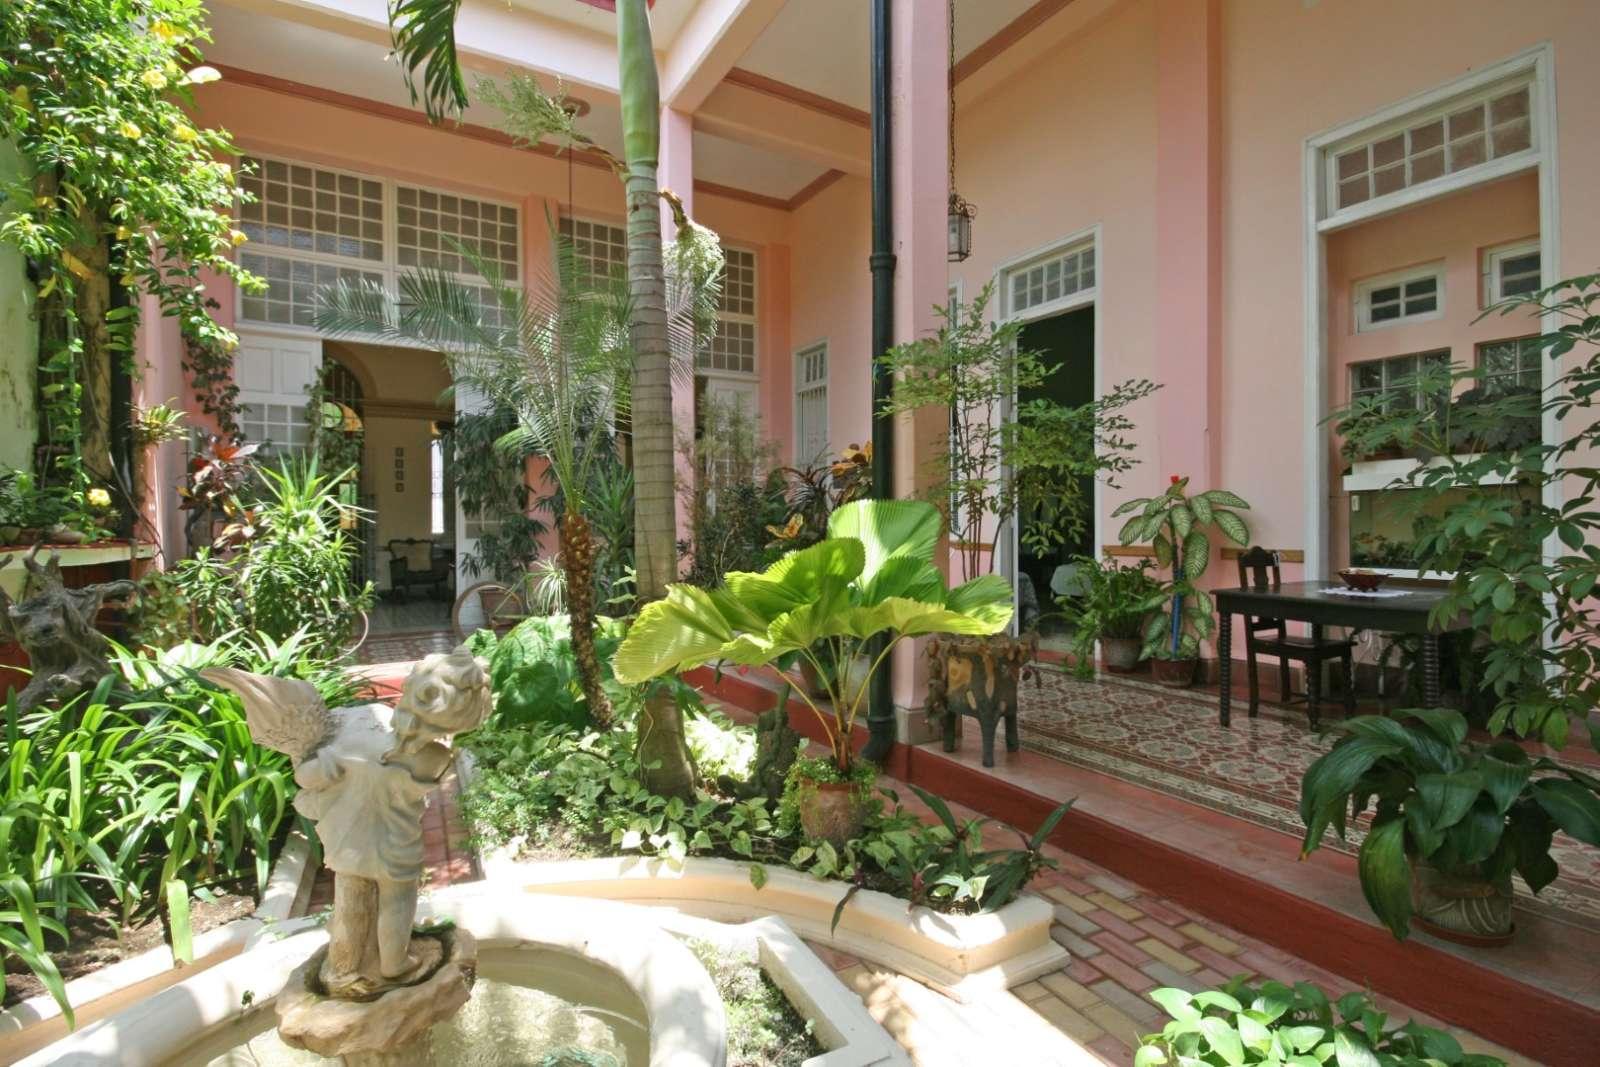 Casa Autentica Pergola in Santa Clara, Cuba